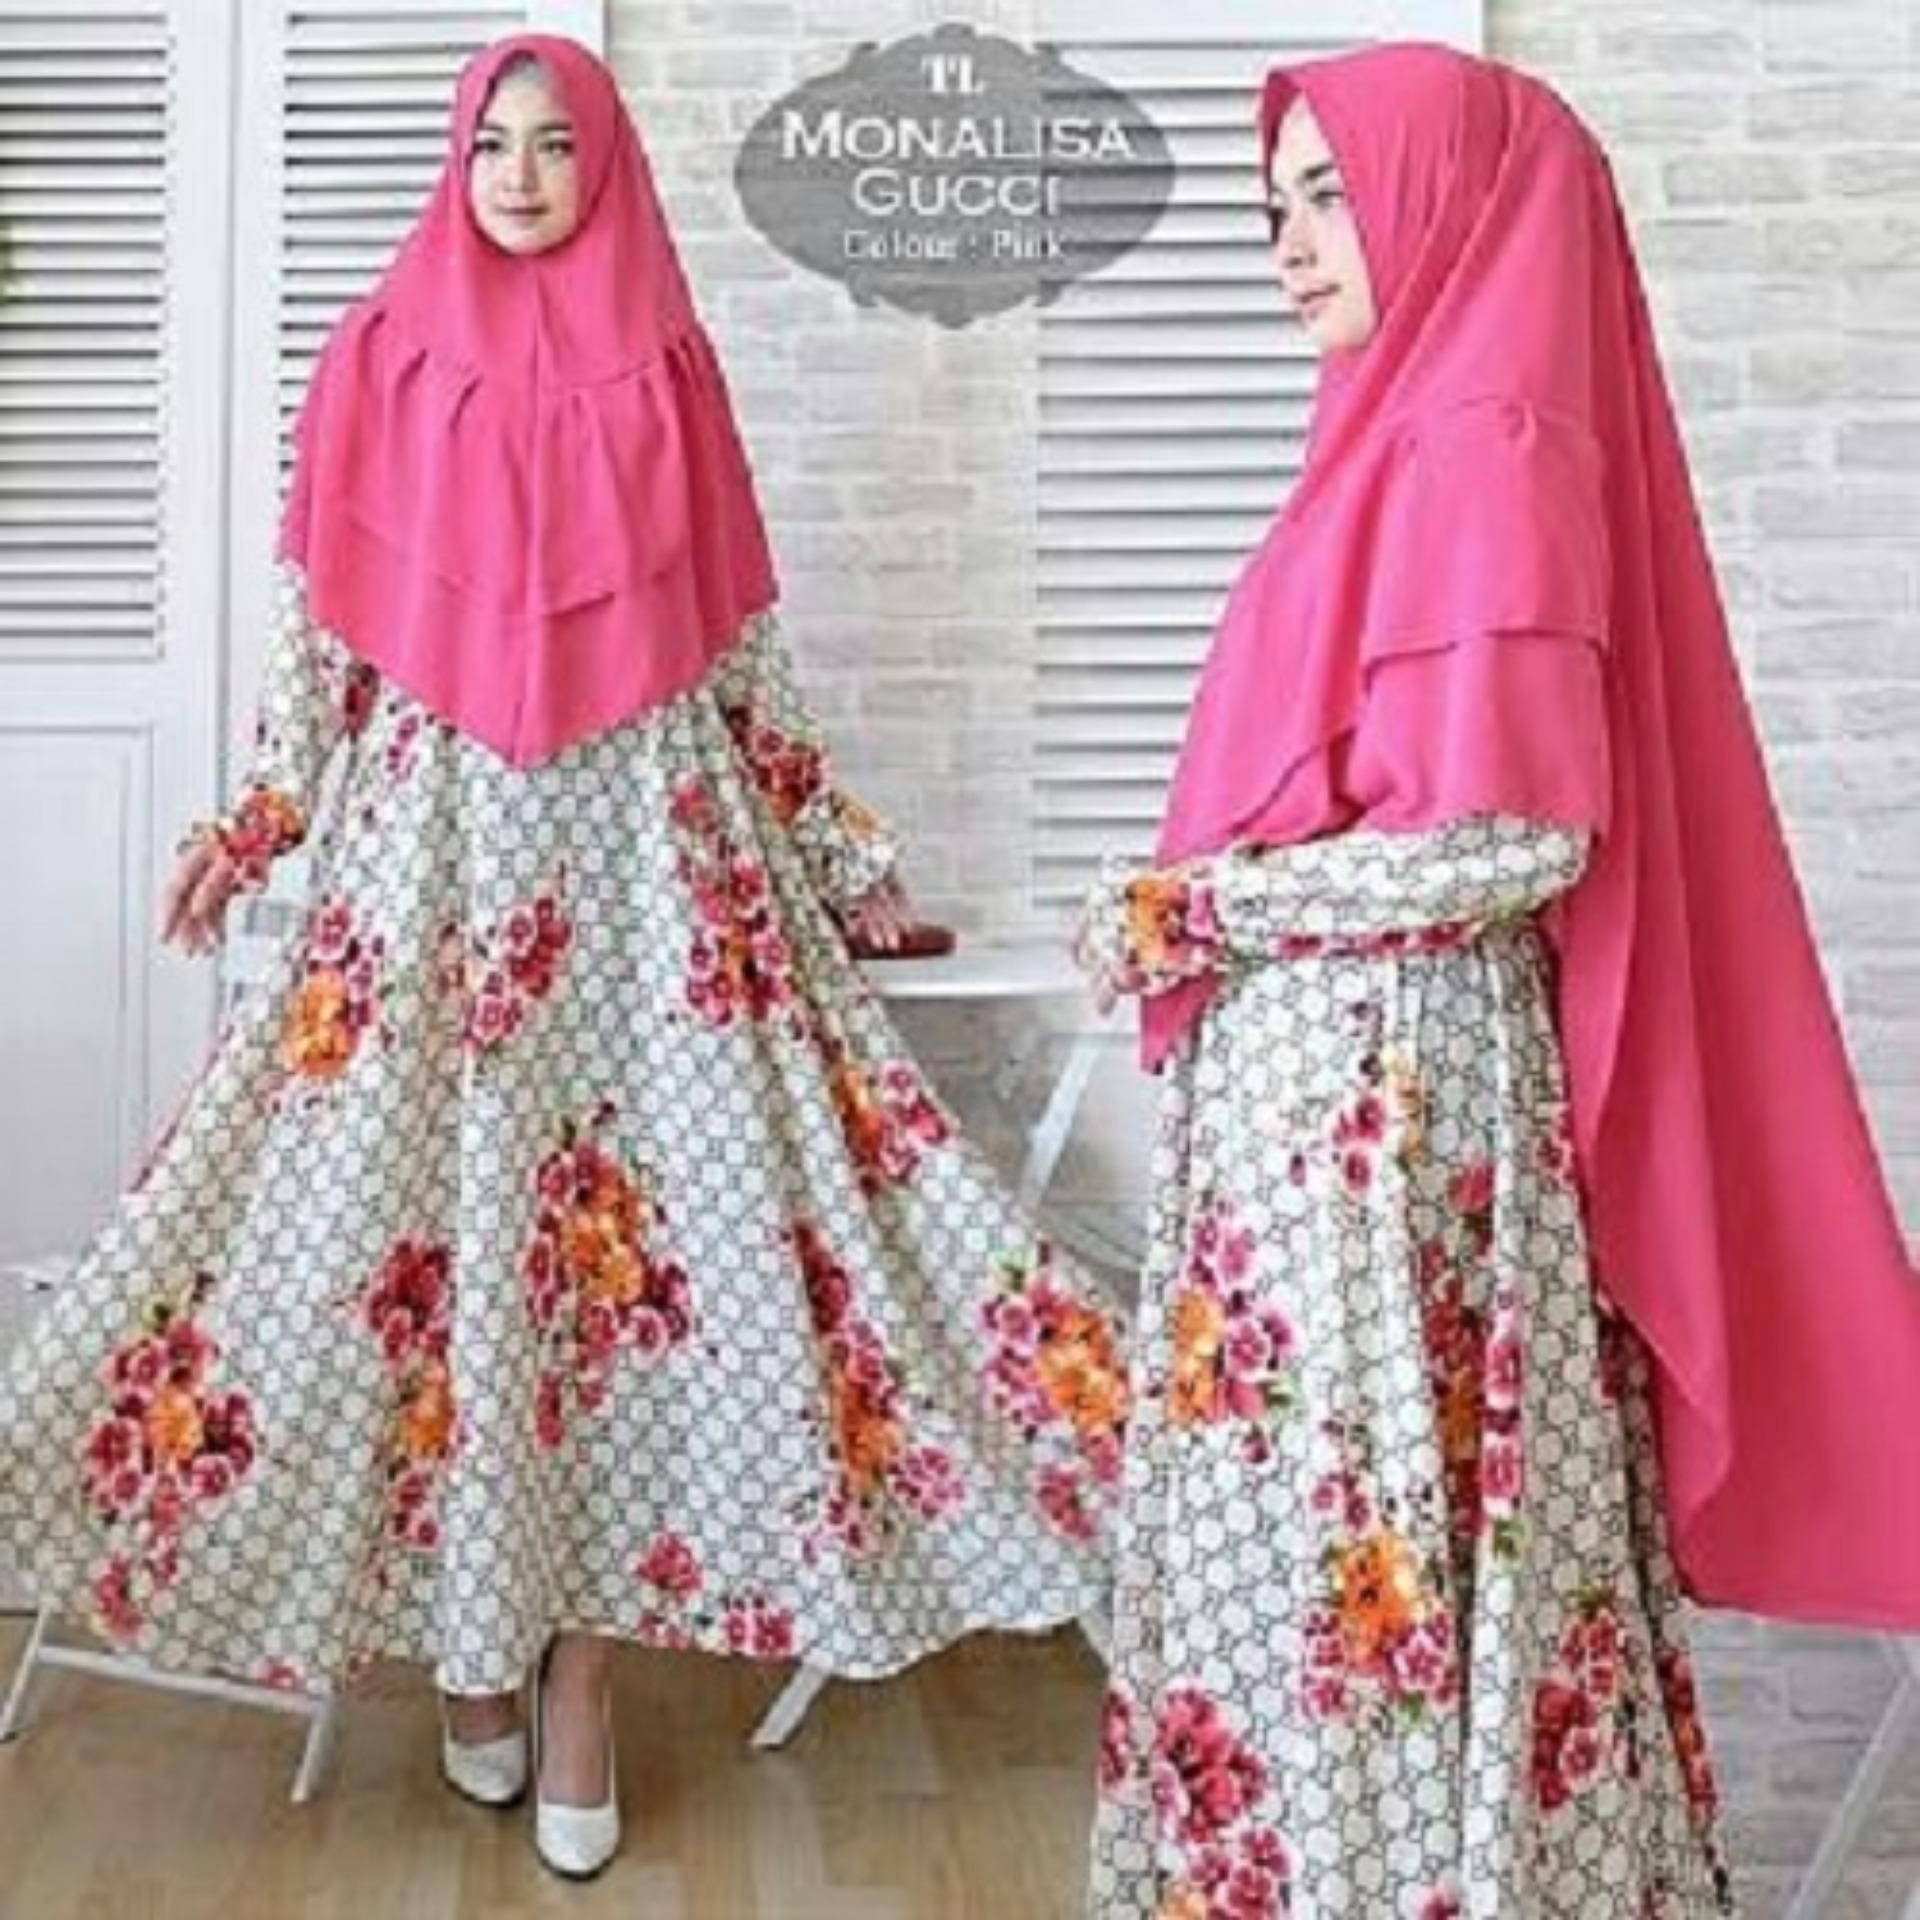 azhari shop - Gamis Wanita Syari - Gamis Muslimah Fashionable - Syari Monalisa Gucci